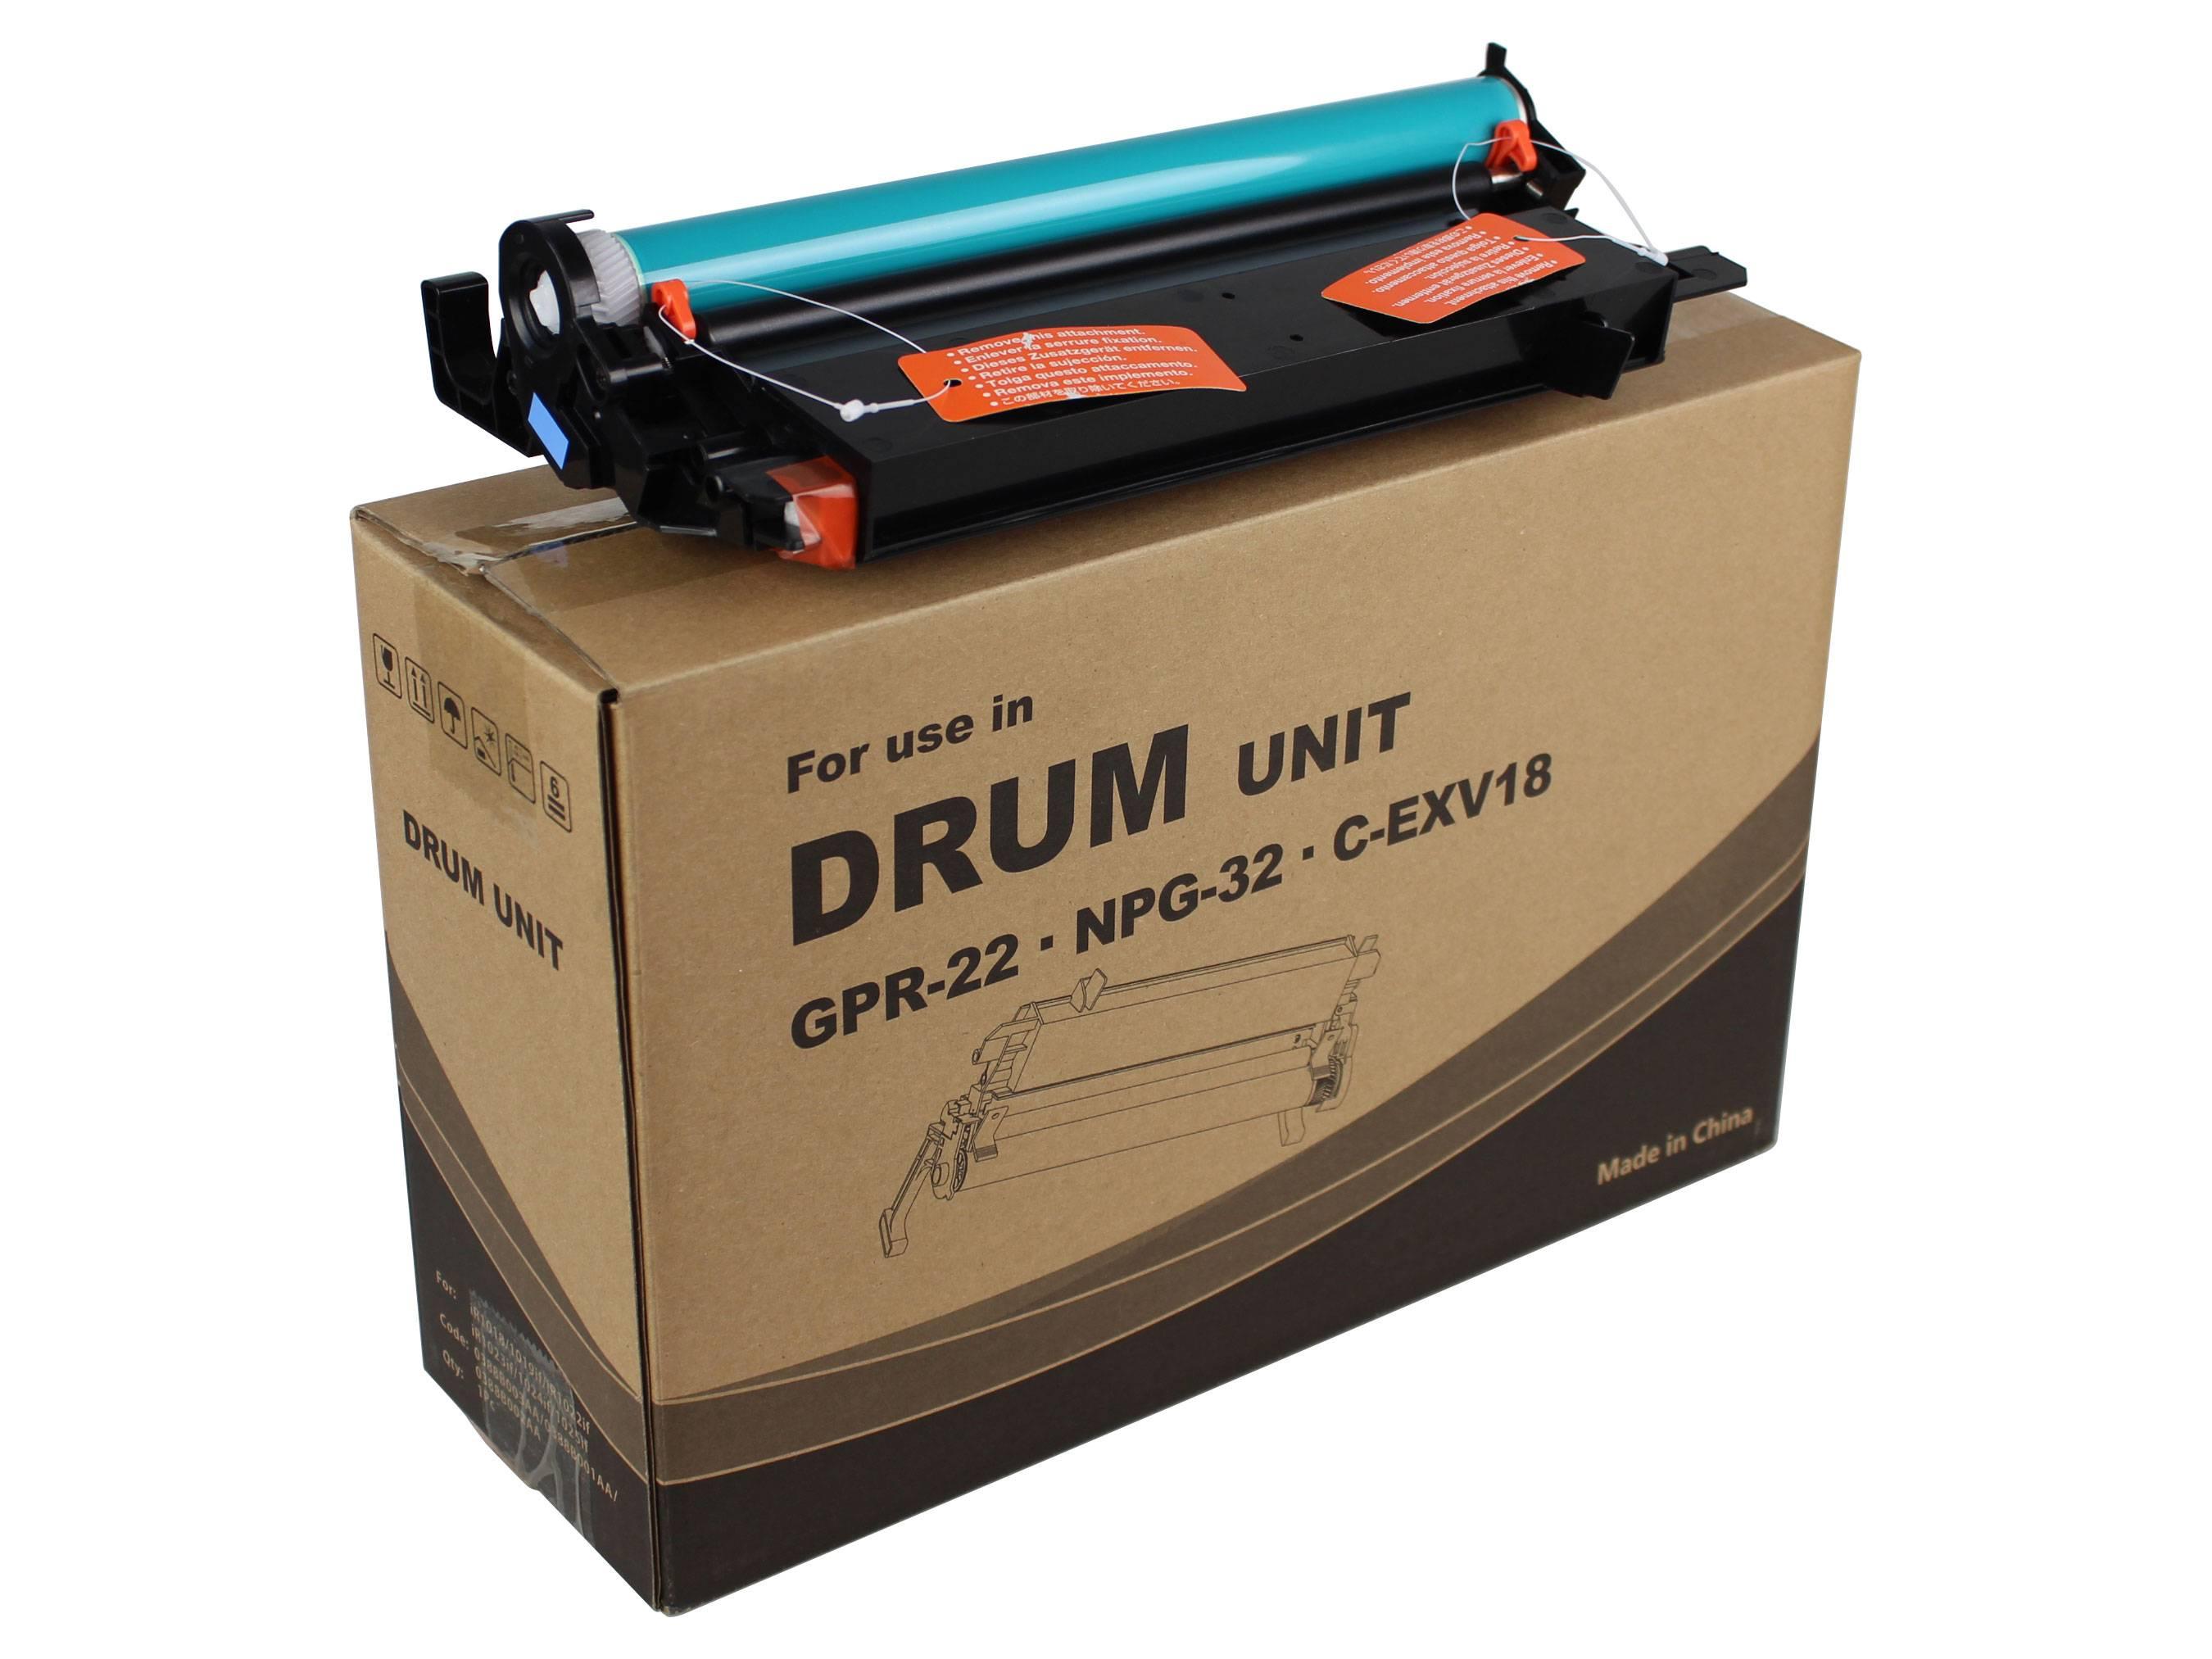 Фото Блок барабана Canon iR 1018, 1020, 1022, 1023, 1025 Drum Unit (C-EXV18, NPG-32, GPR-22) (JPN) {5818U}